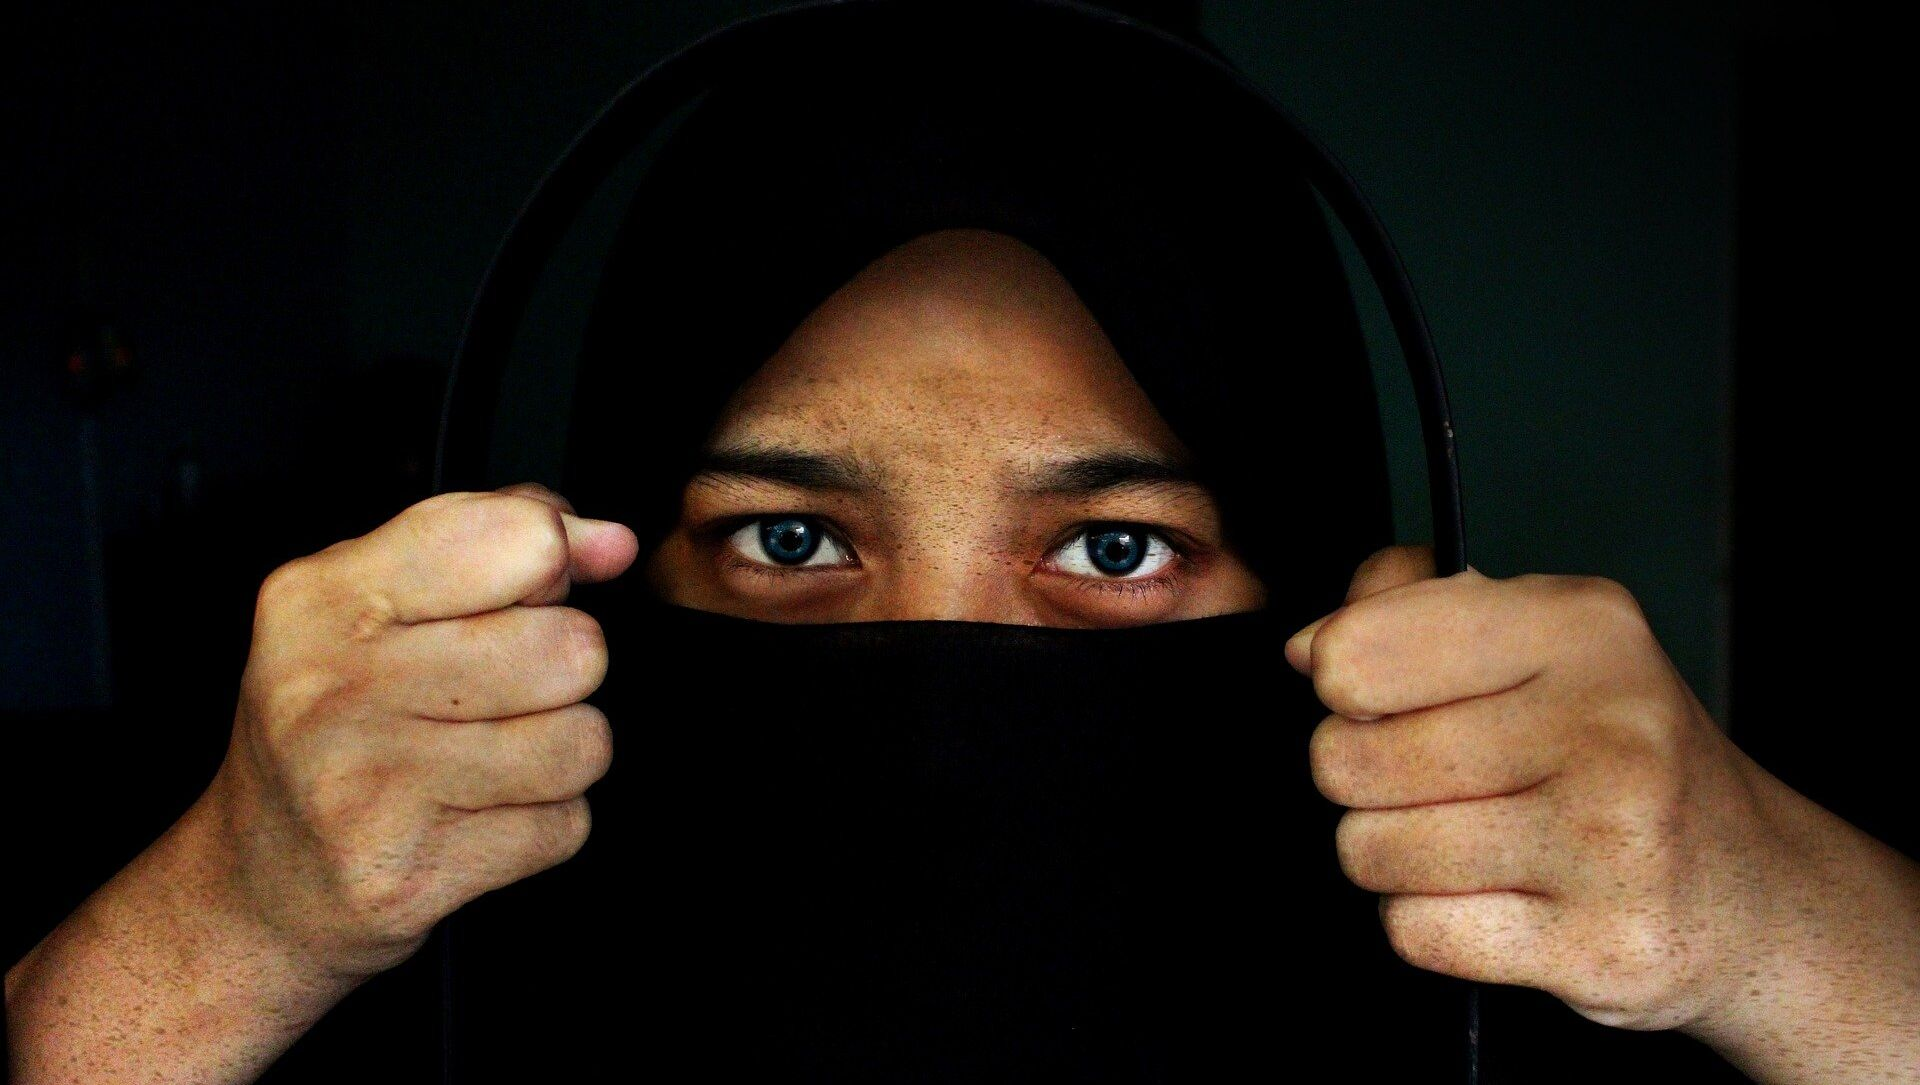 Una donna che indossa un hijab - Sputnik Italia, 1920, 30.04.2021